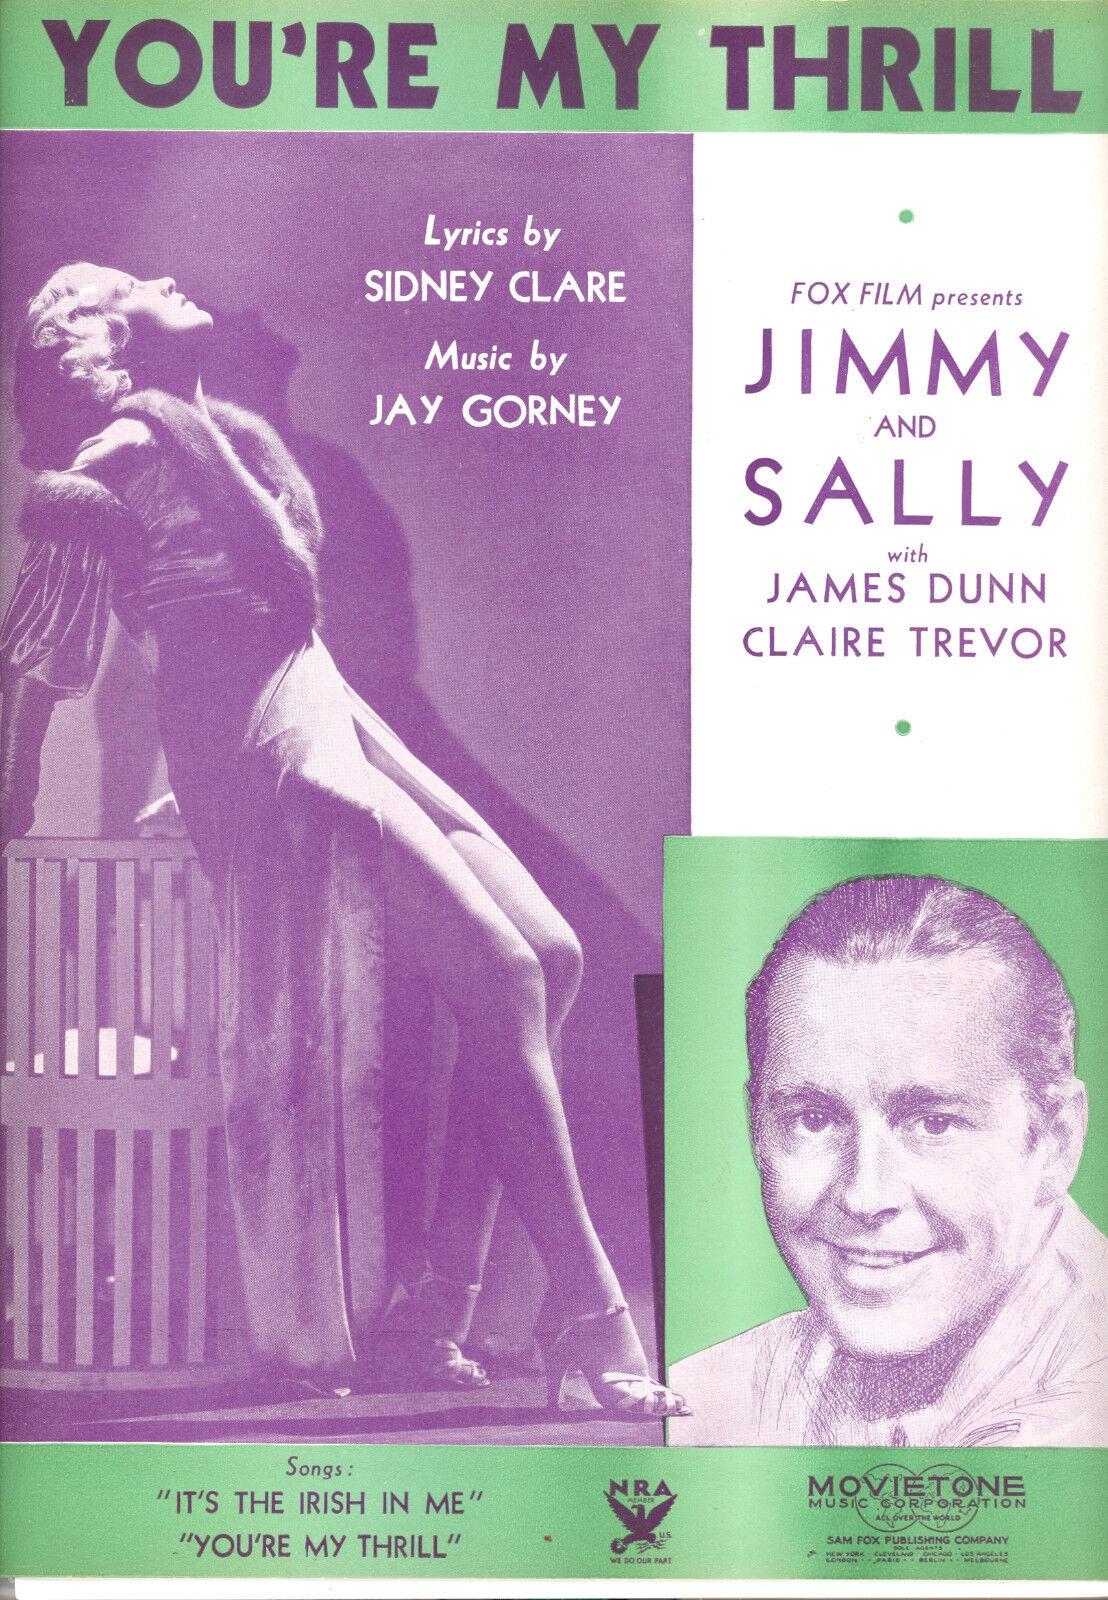 Jimmy & Sally Notenblatt   You'Re My Thrill   Claire Trevor James Dunn